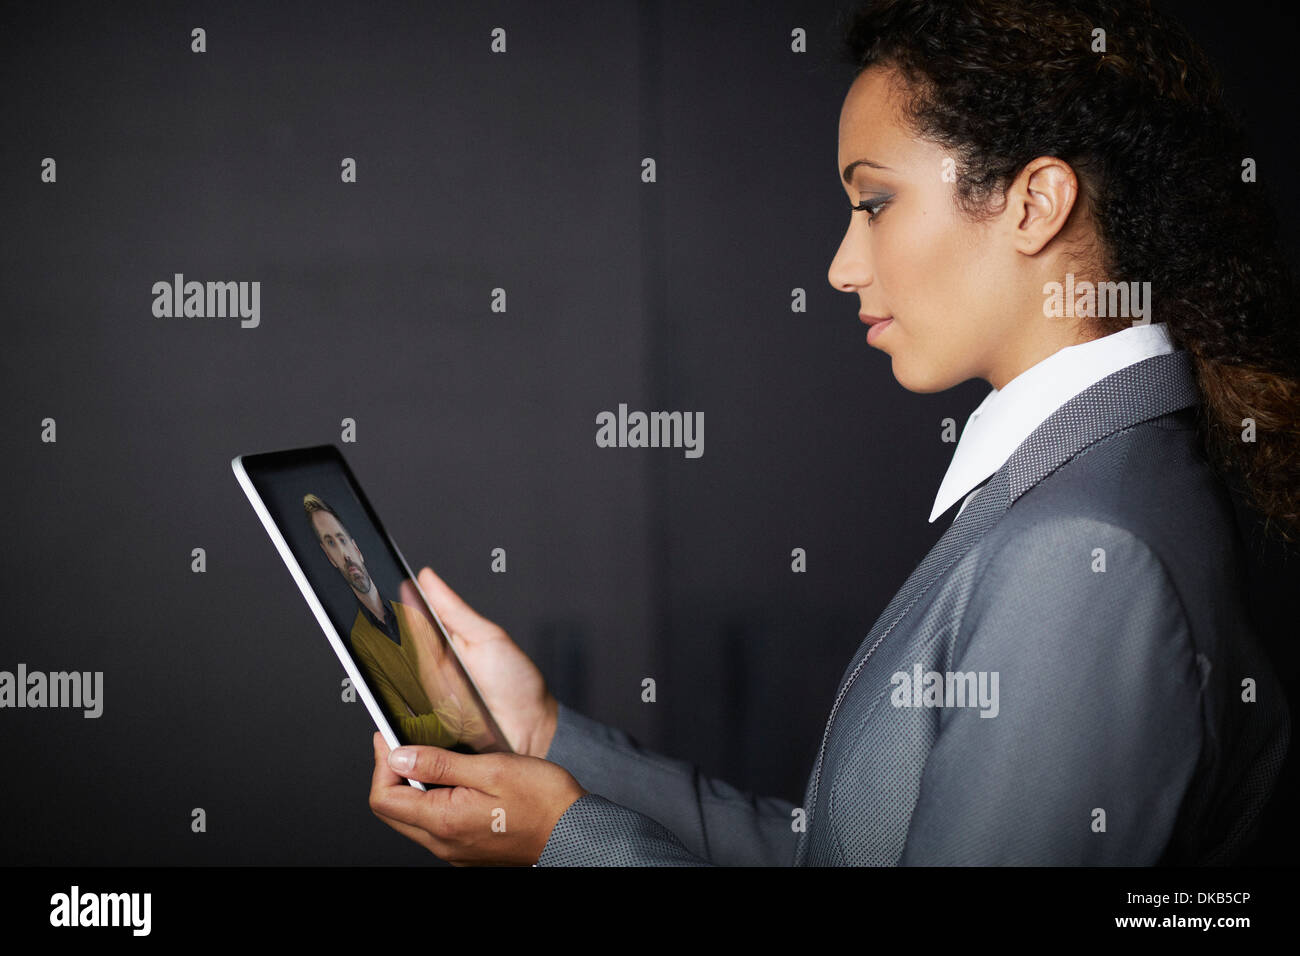 Businesswoman using digital tablet Banque D'Images